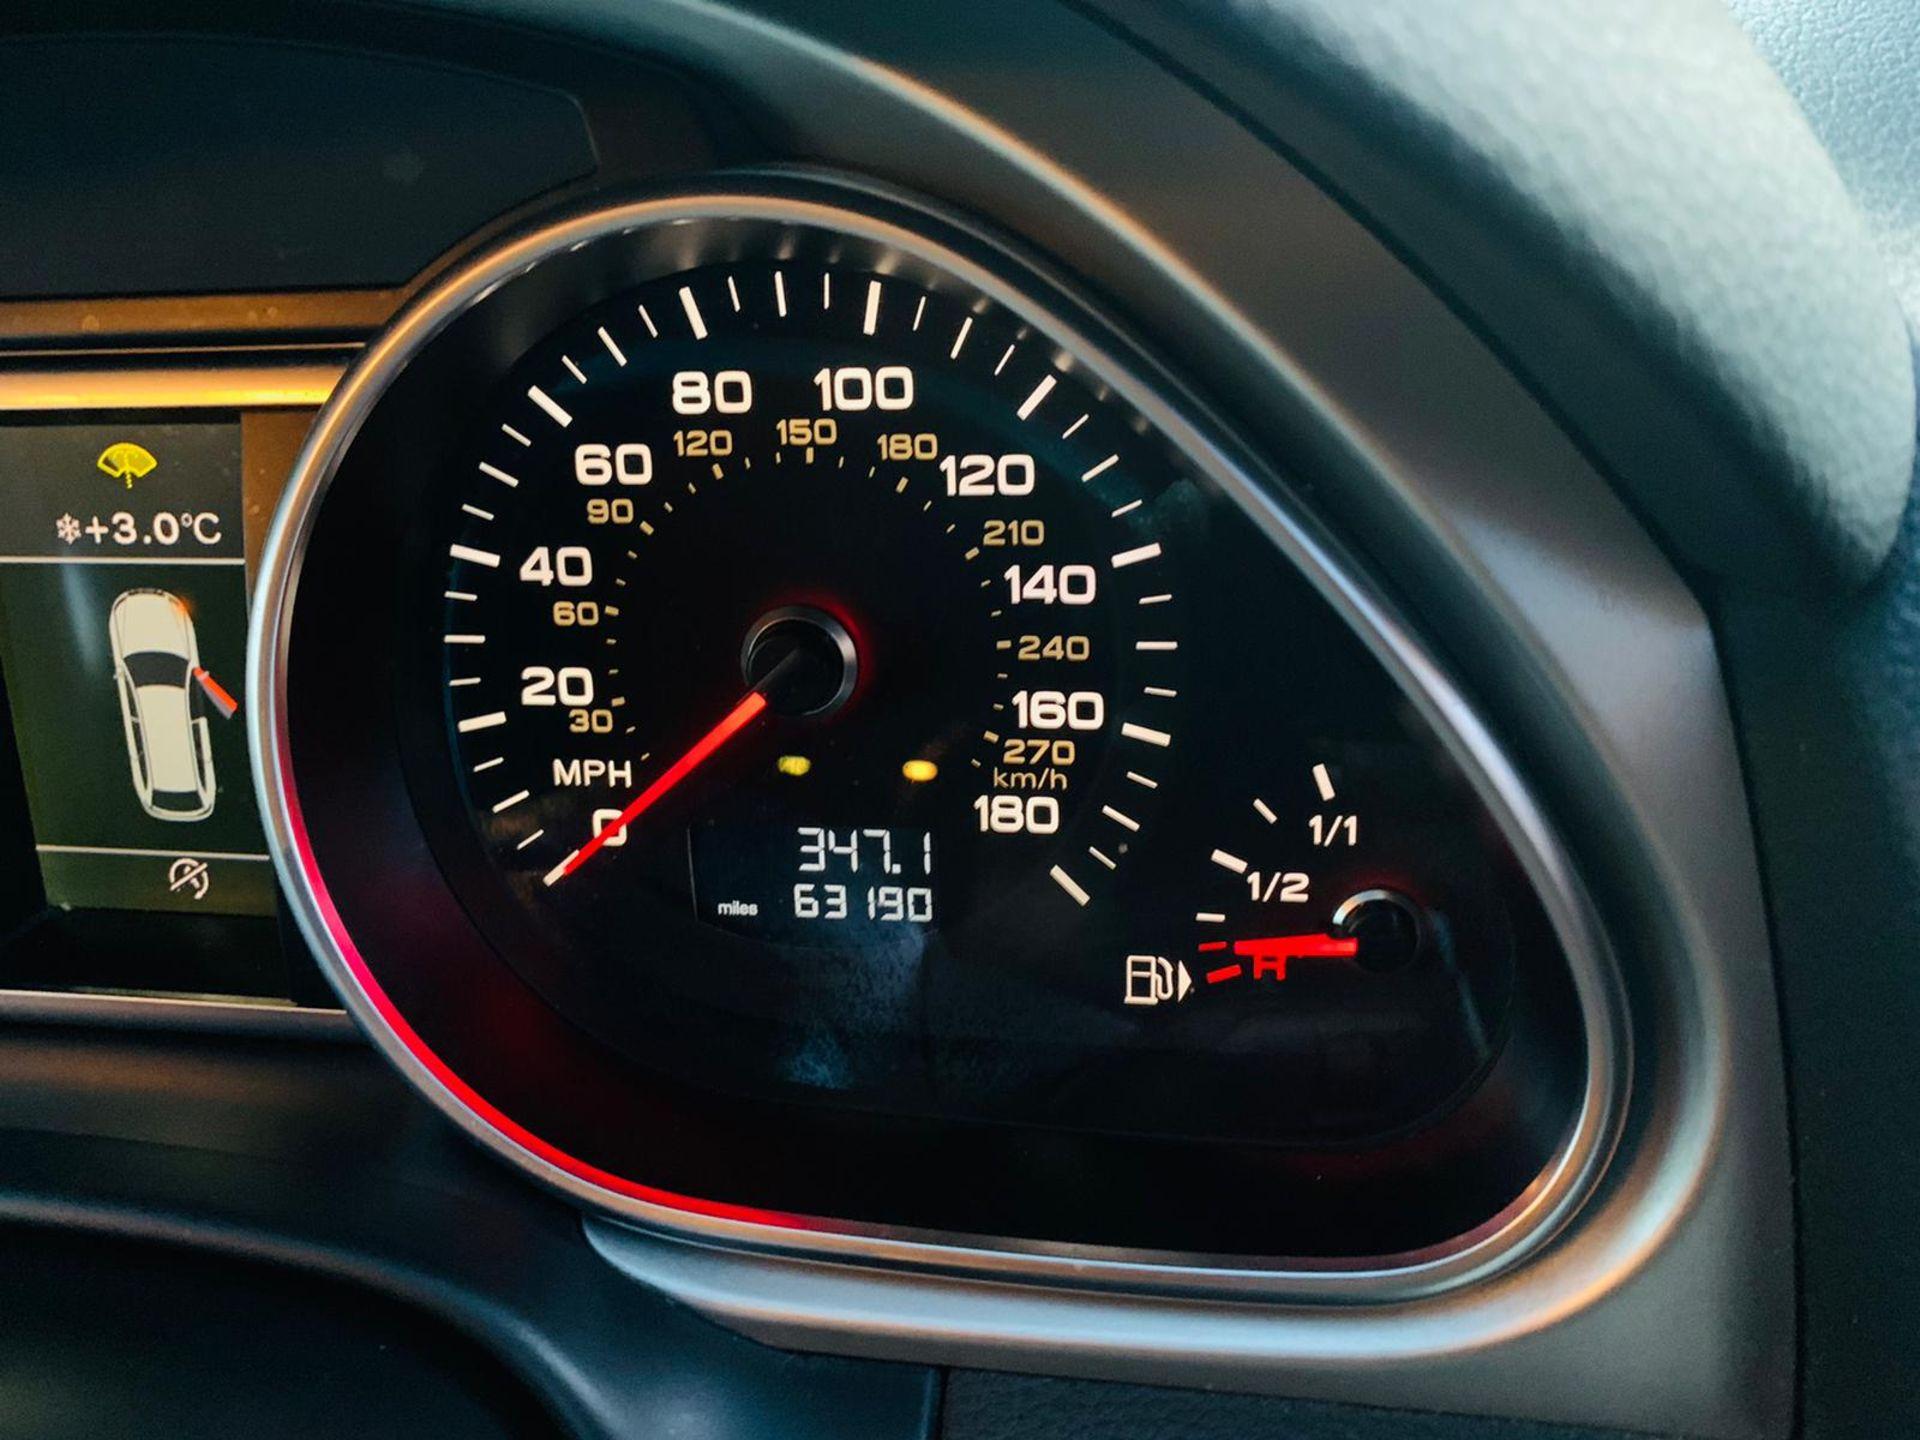 (Reserve Met)Audi Q7 3.0 TDI Quattro S Line Plus Auto (7 Seats) - 12 Reg - Only 63k Miles -Sat Nav- - Image 37 of 37